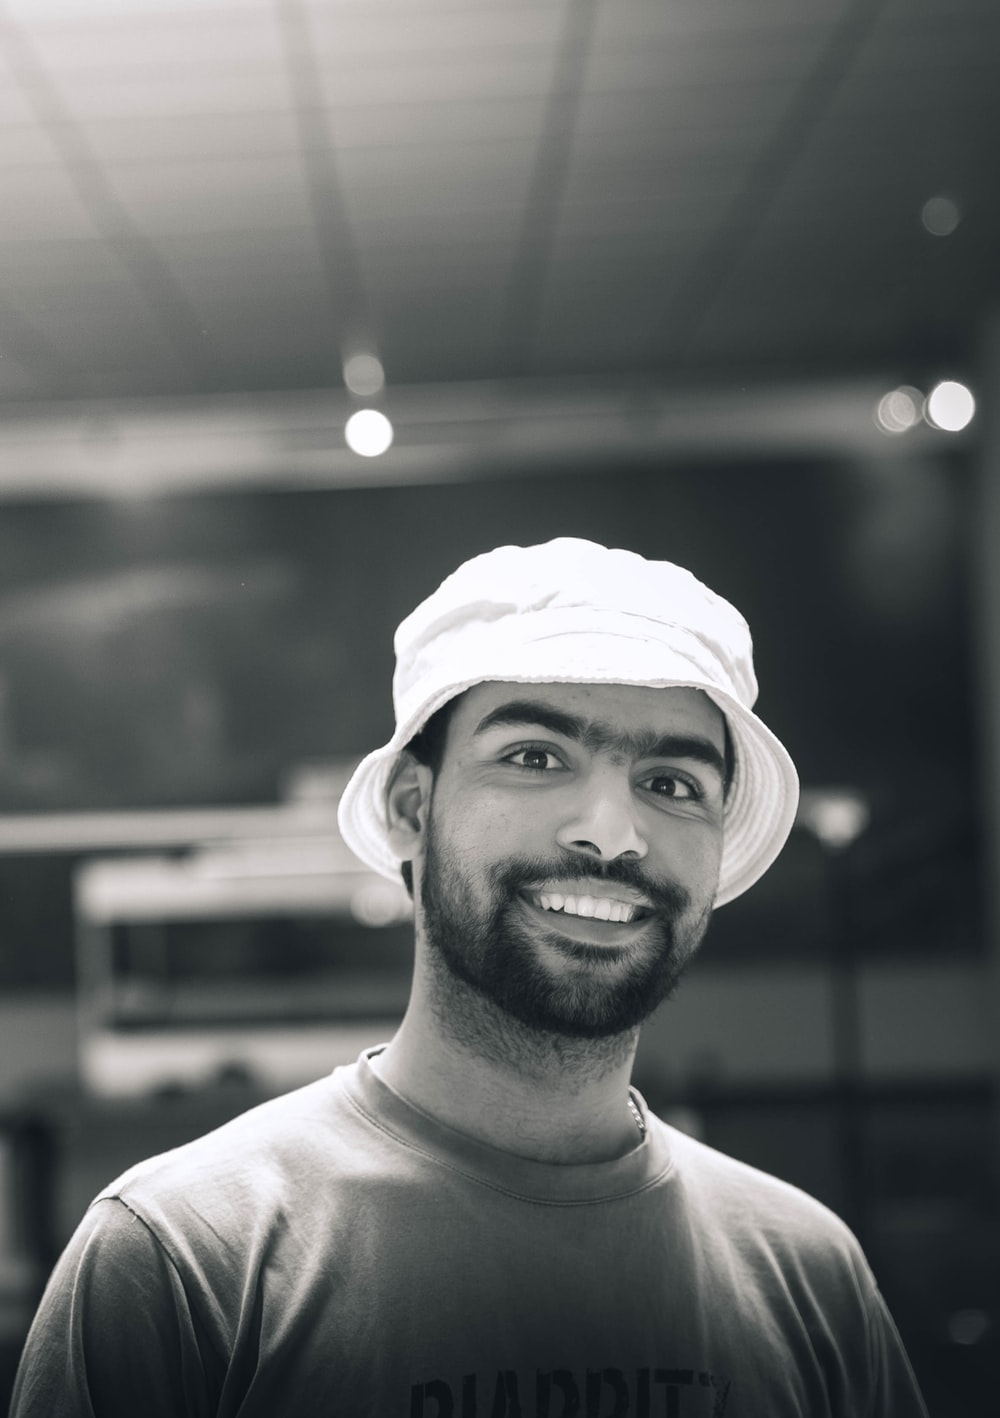 man in white crew neck shirt smiling